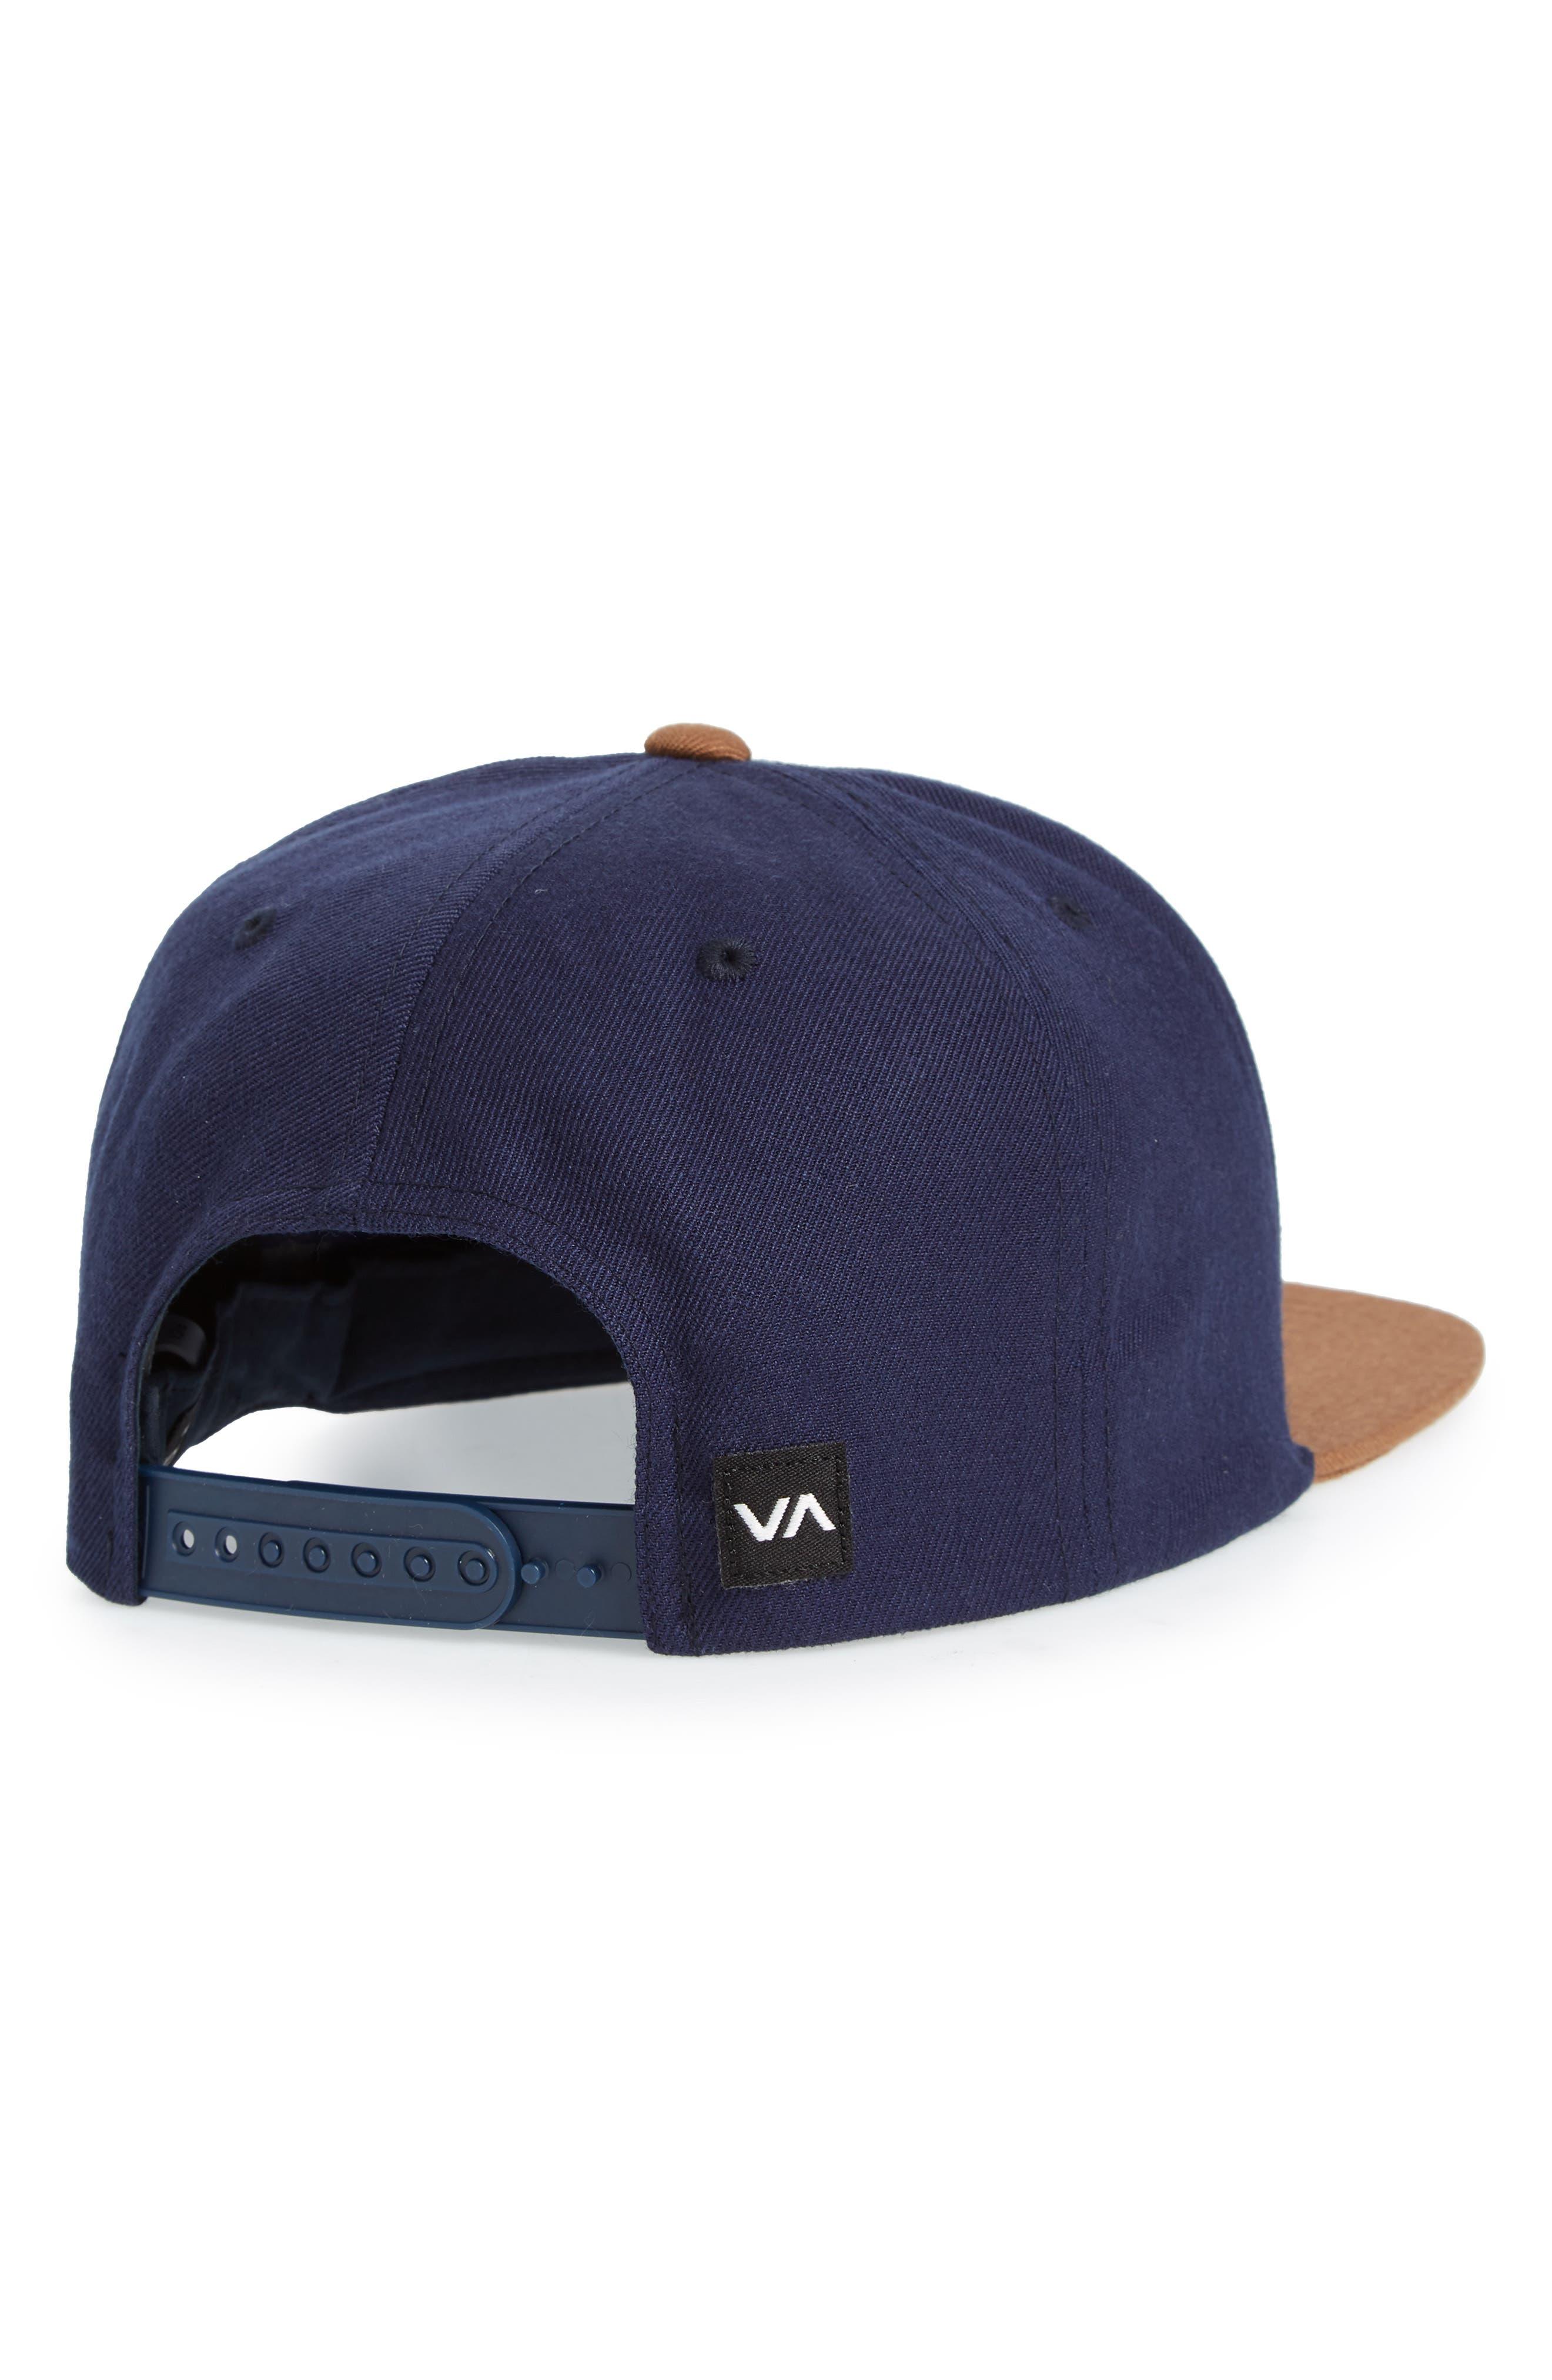 Commonwealth III Snapback Hat,                             Alternate thumbnail 2, color,                             Navy